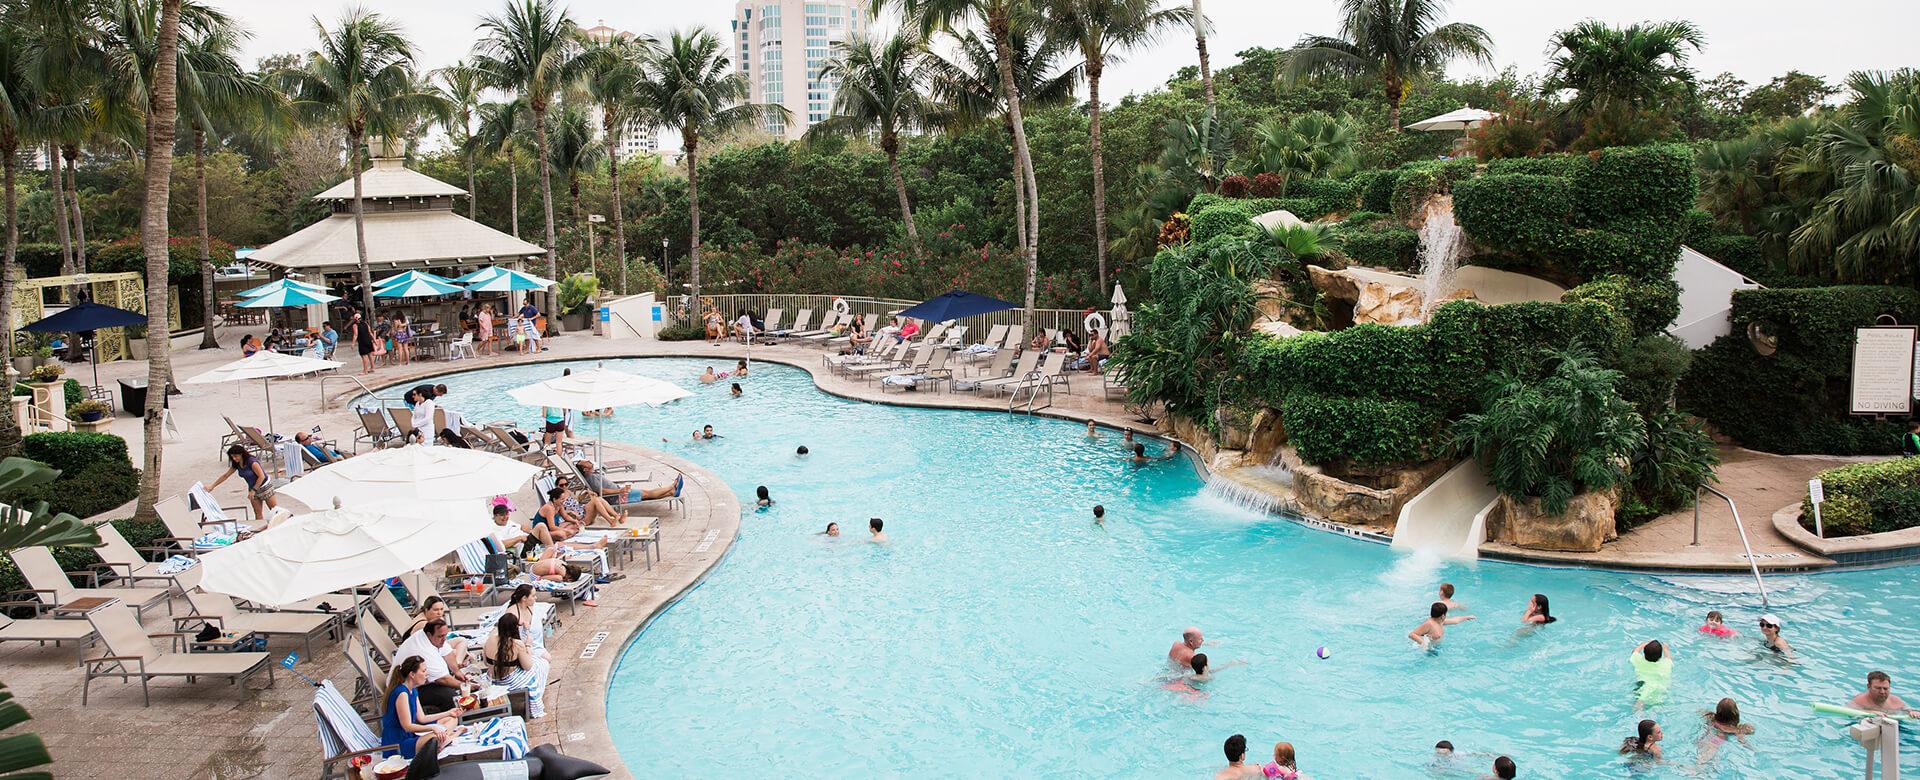 September Trip Planning  Naples Grande Beach Resort